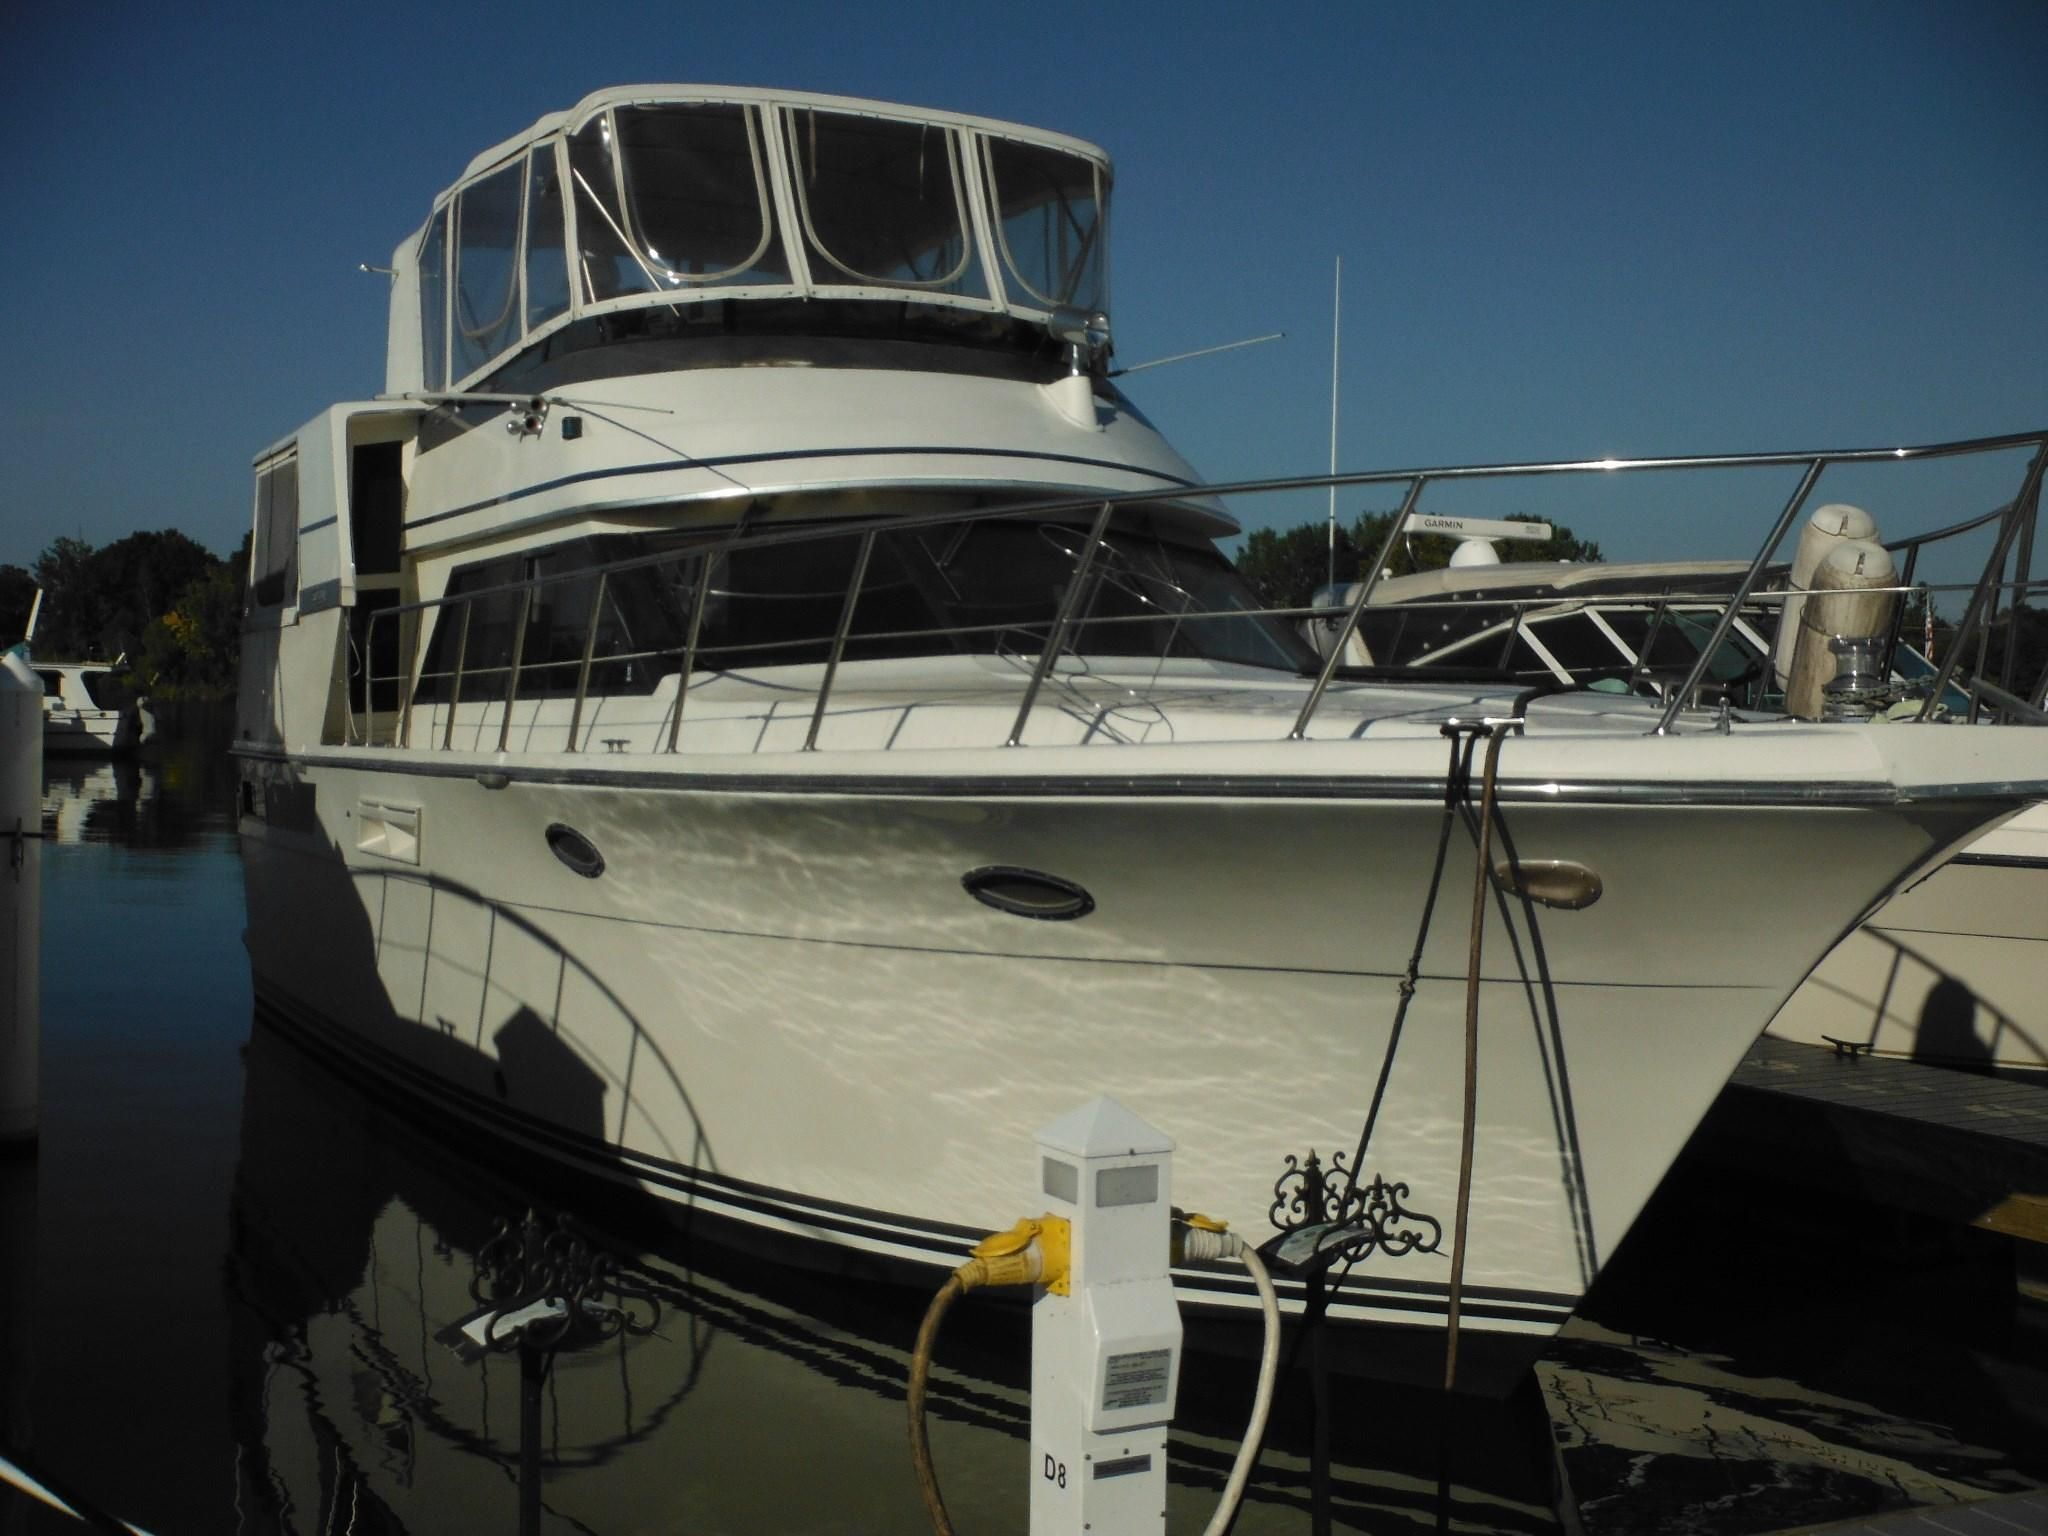 1990 californian 45 motoryacht power boat for sale www. Black Bedroom Furniture Sets. Home Design Ideas